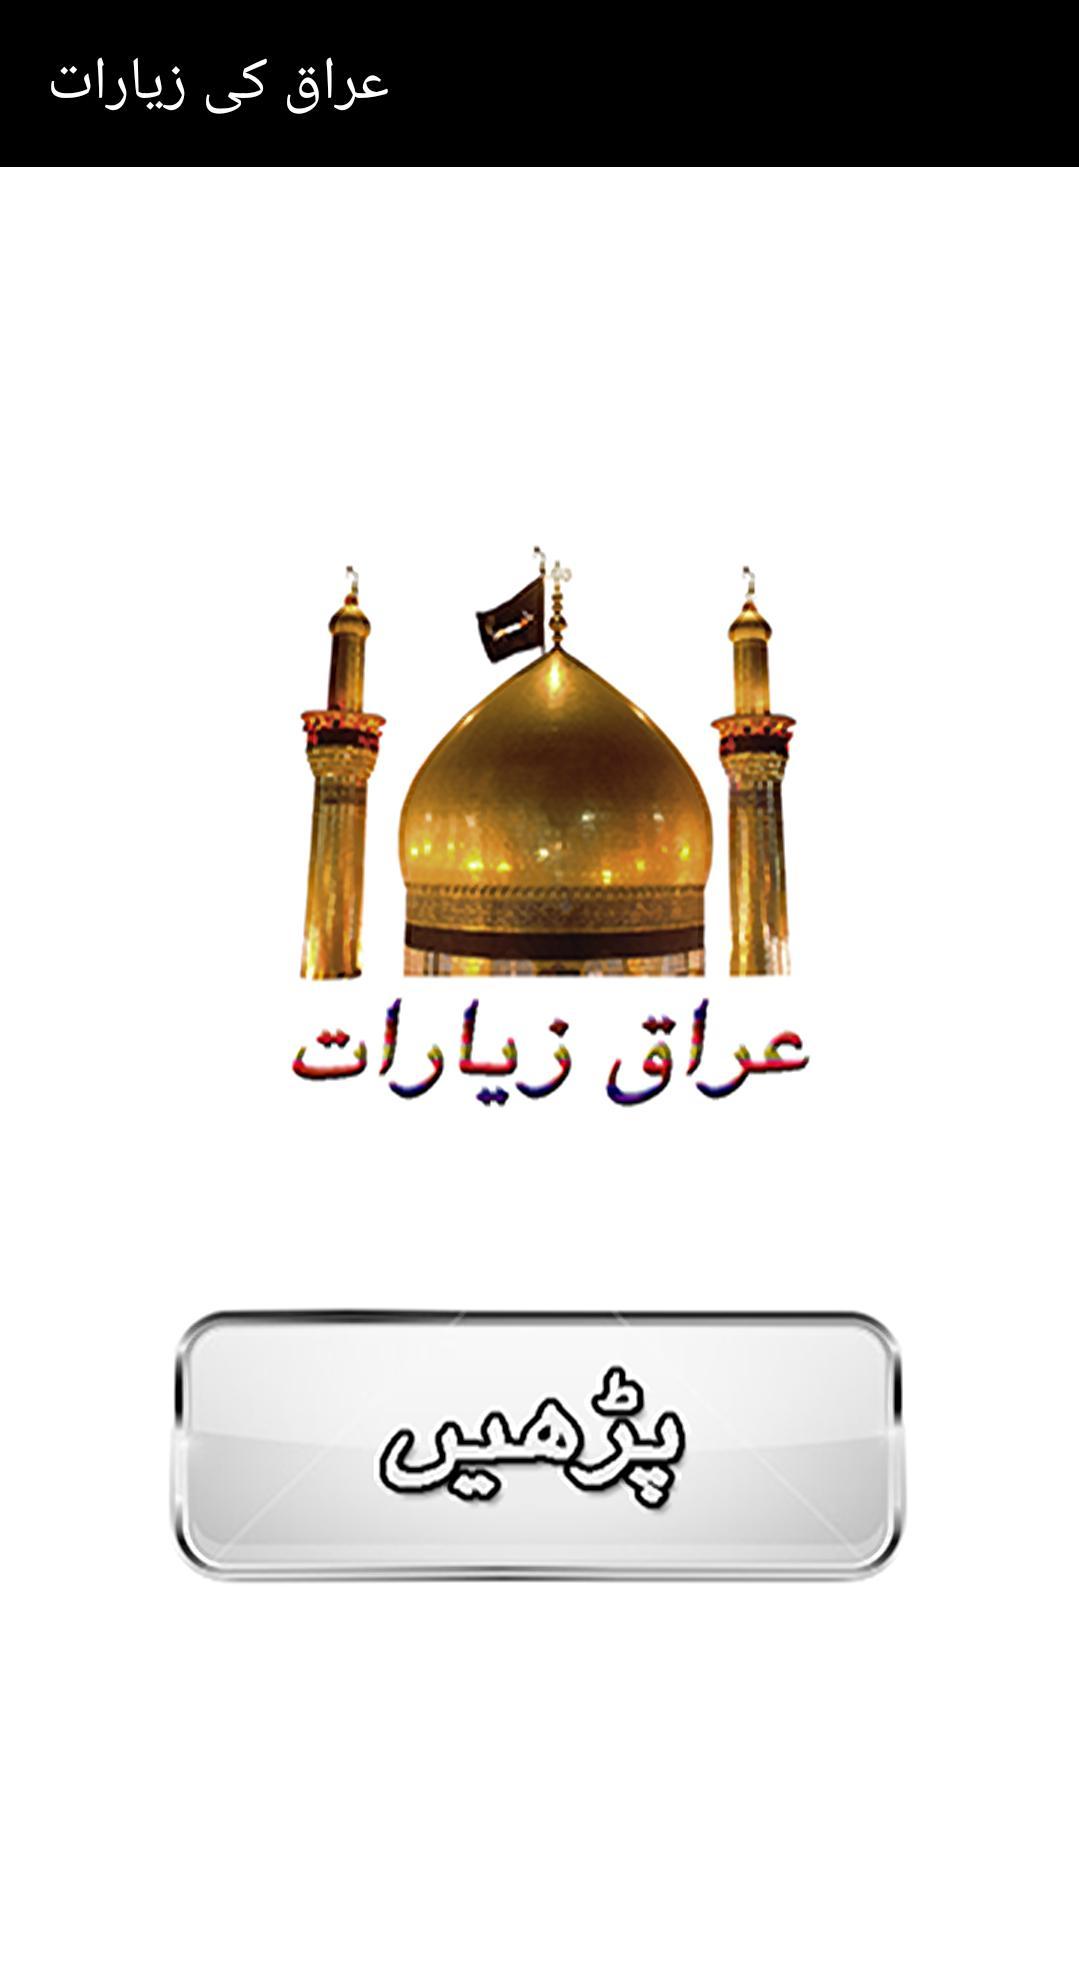 Iraq ki Ziyarat for Android - APK Download